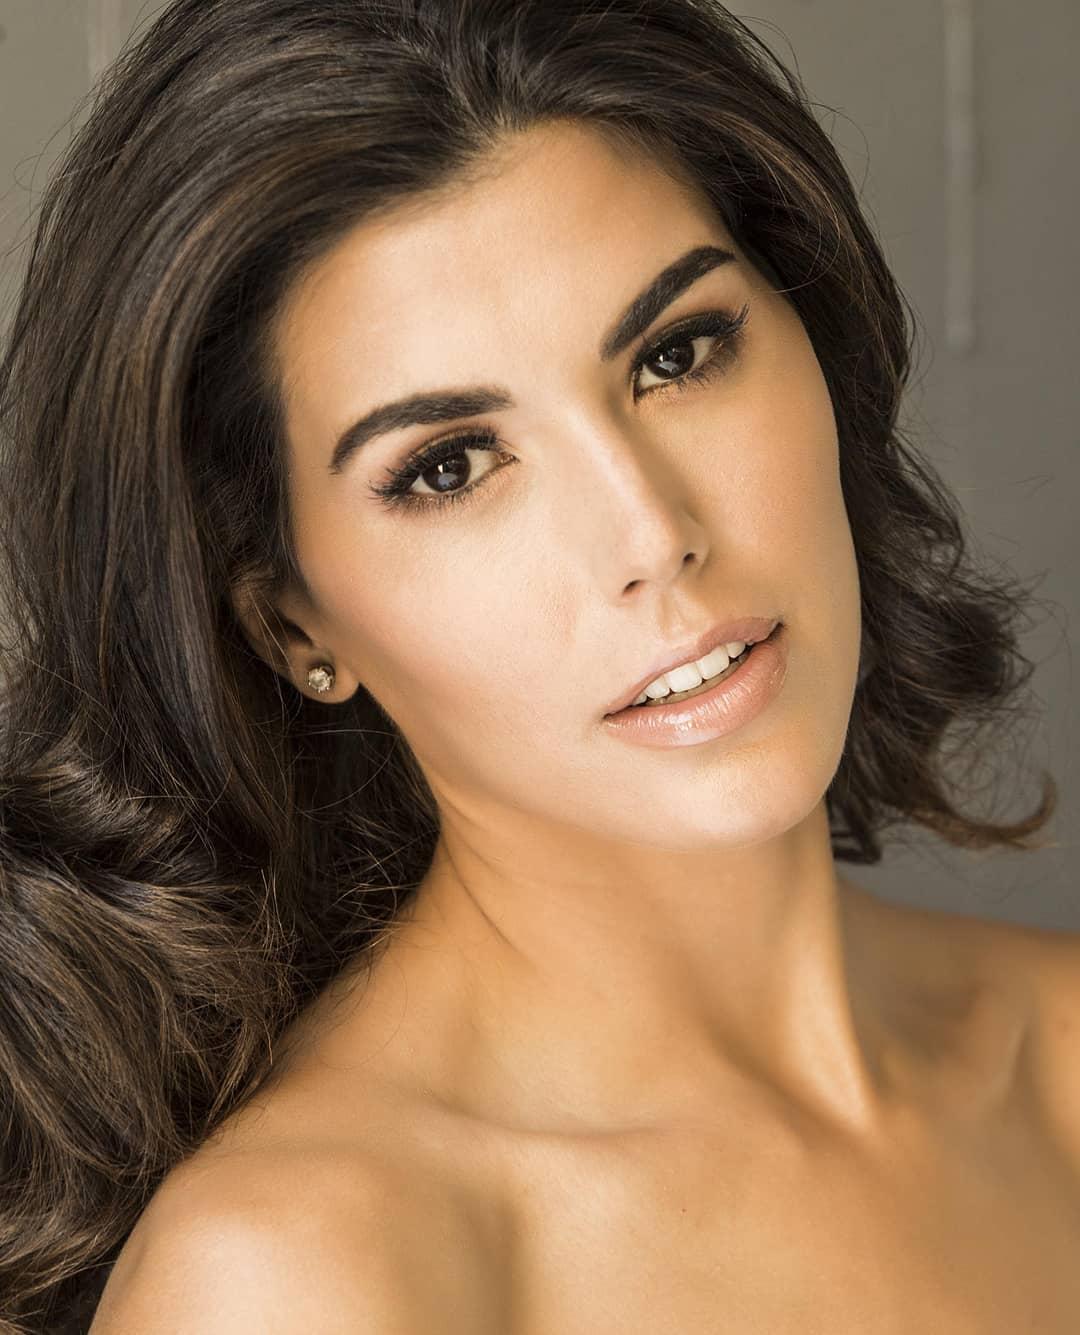 sofia del prado, reyna hispanoamericana 2015, top 10 de miss universe 2017. - Página 5 23507112